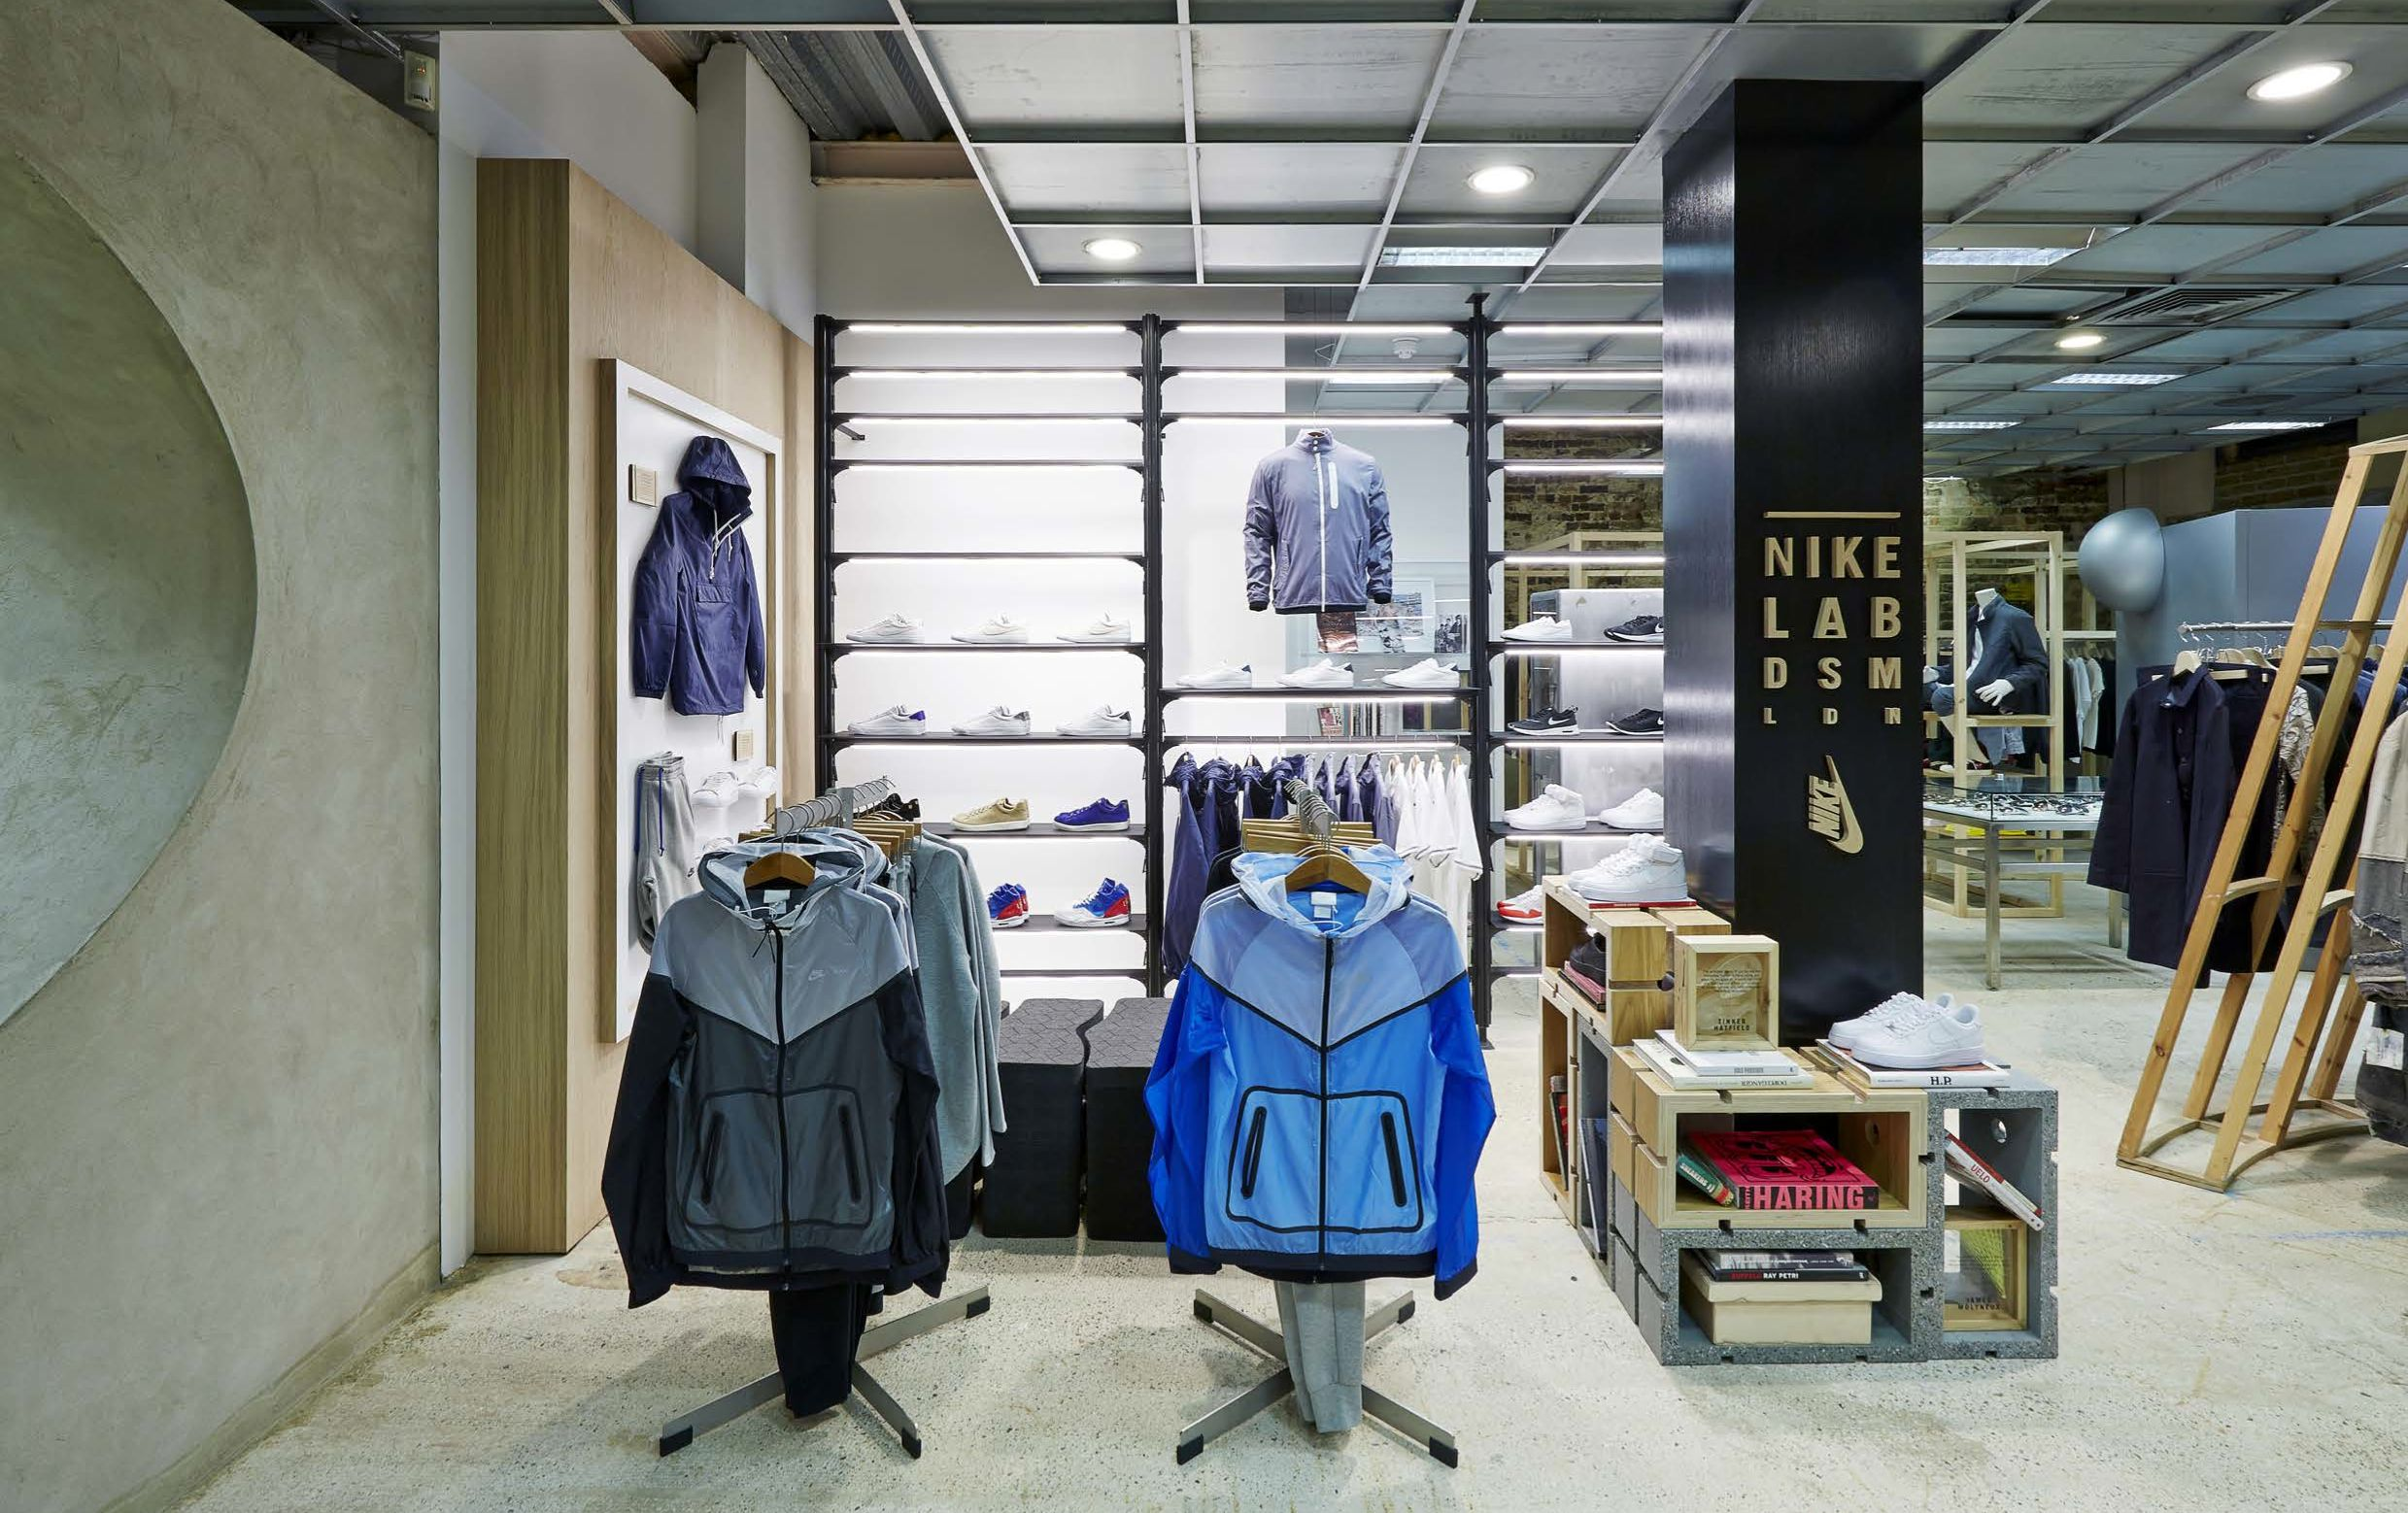 Nikelab Dsm London Snapshot Lr Retail Interior Dover